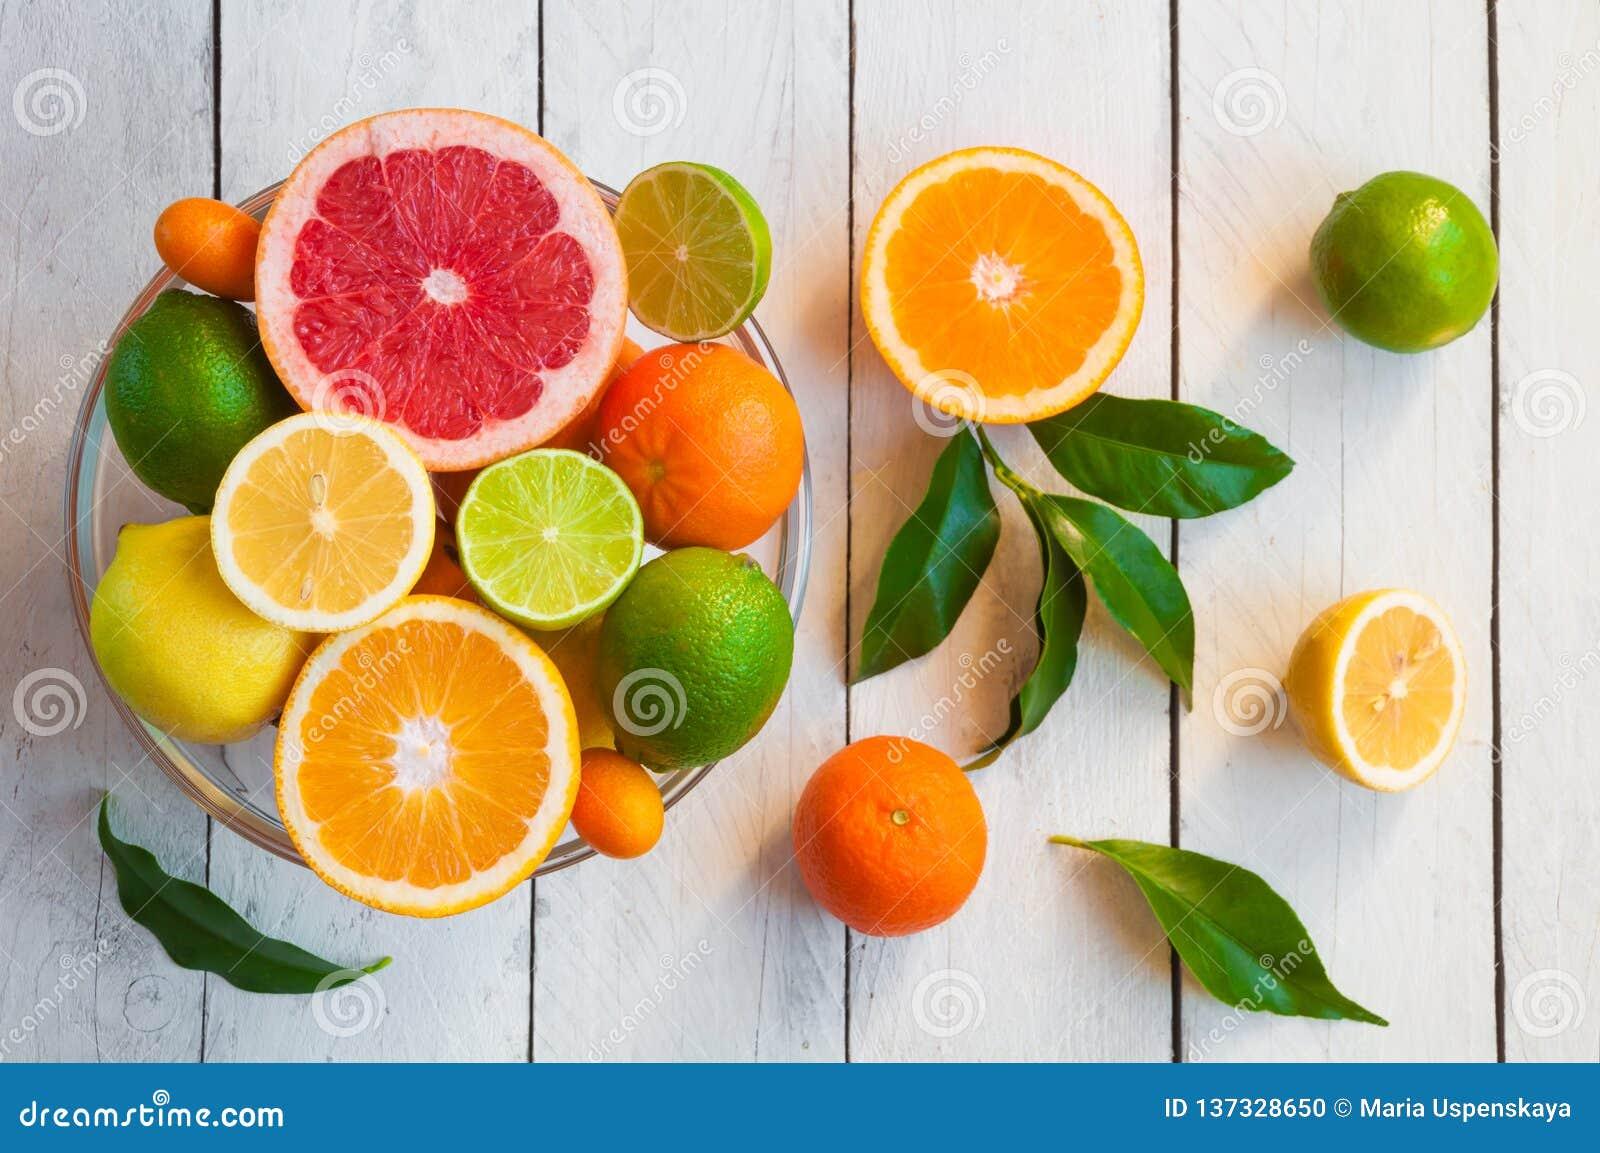 Fresh citrus fruits orange, lemon, grapefruit, mandarin, lime with leaves